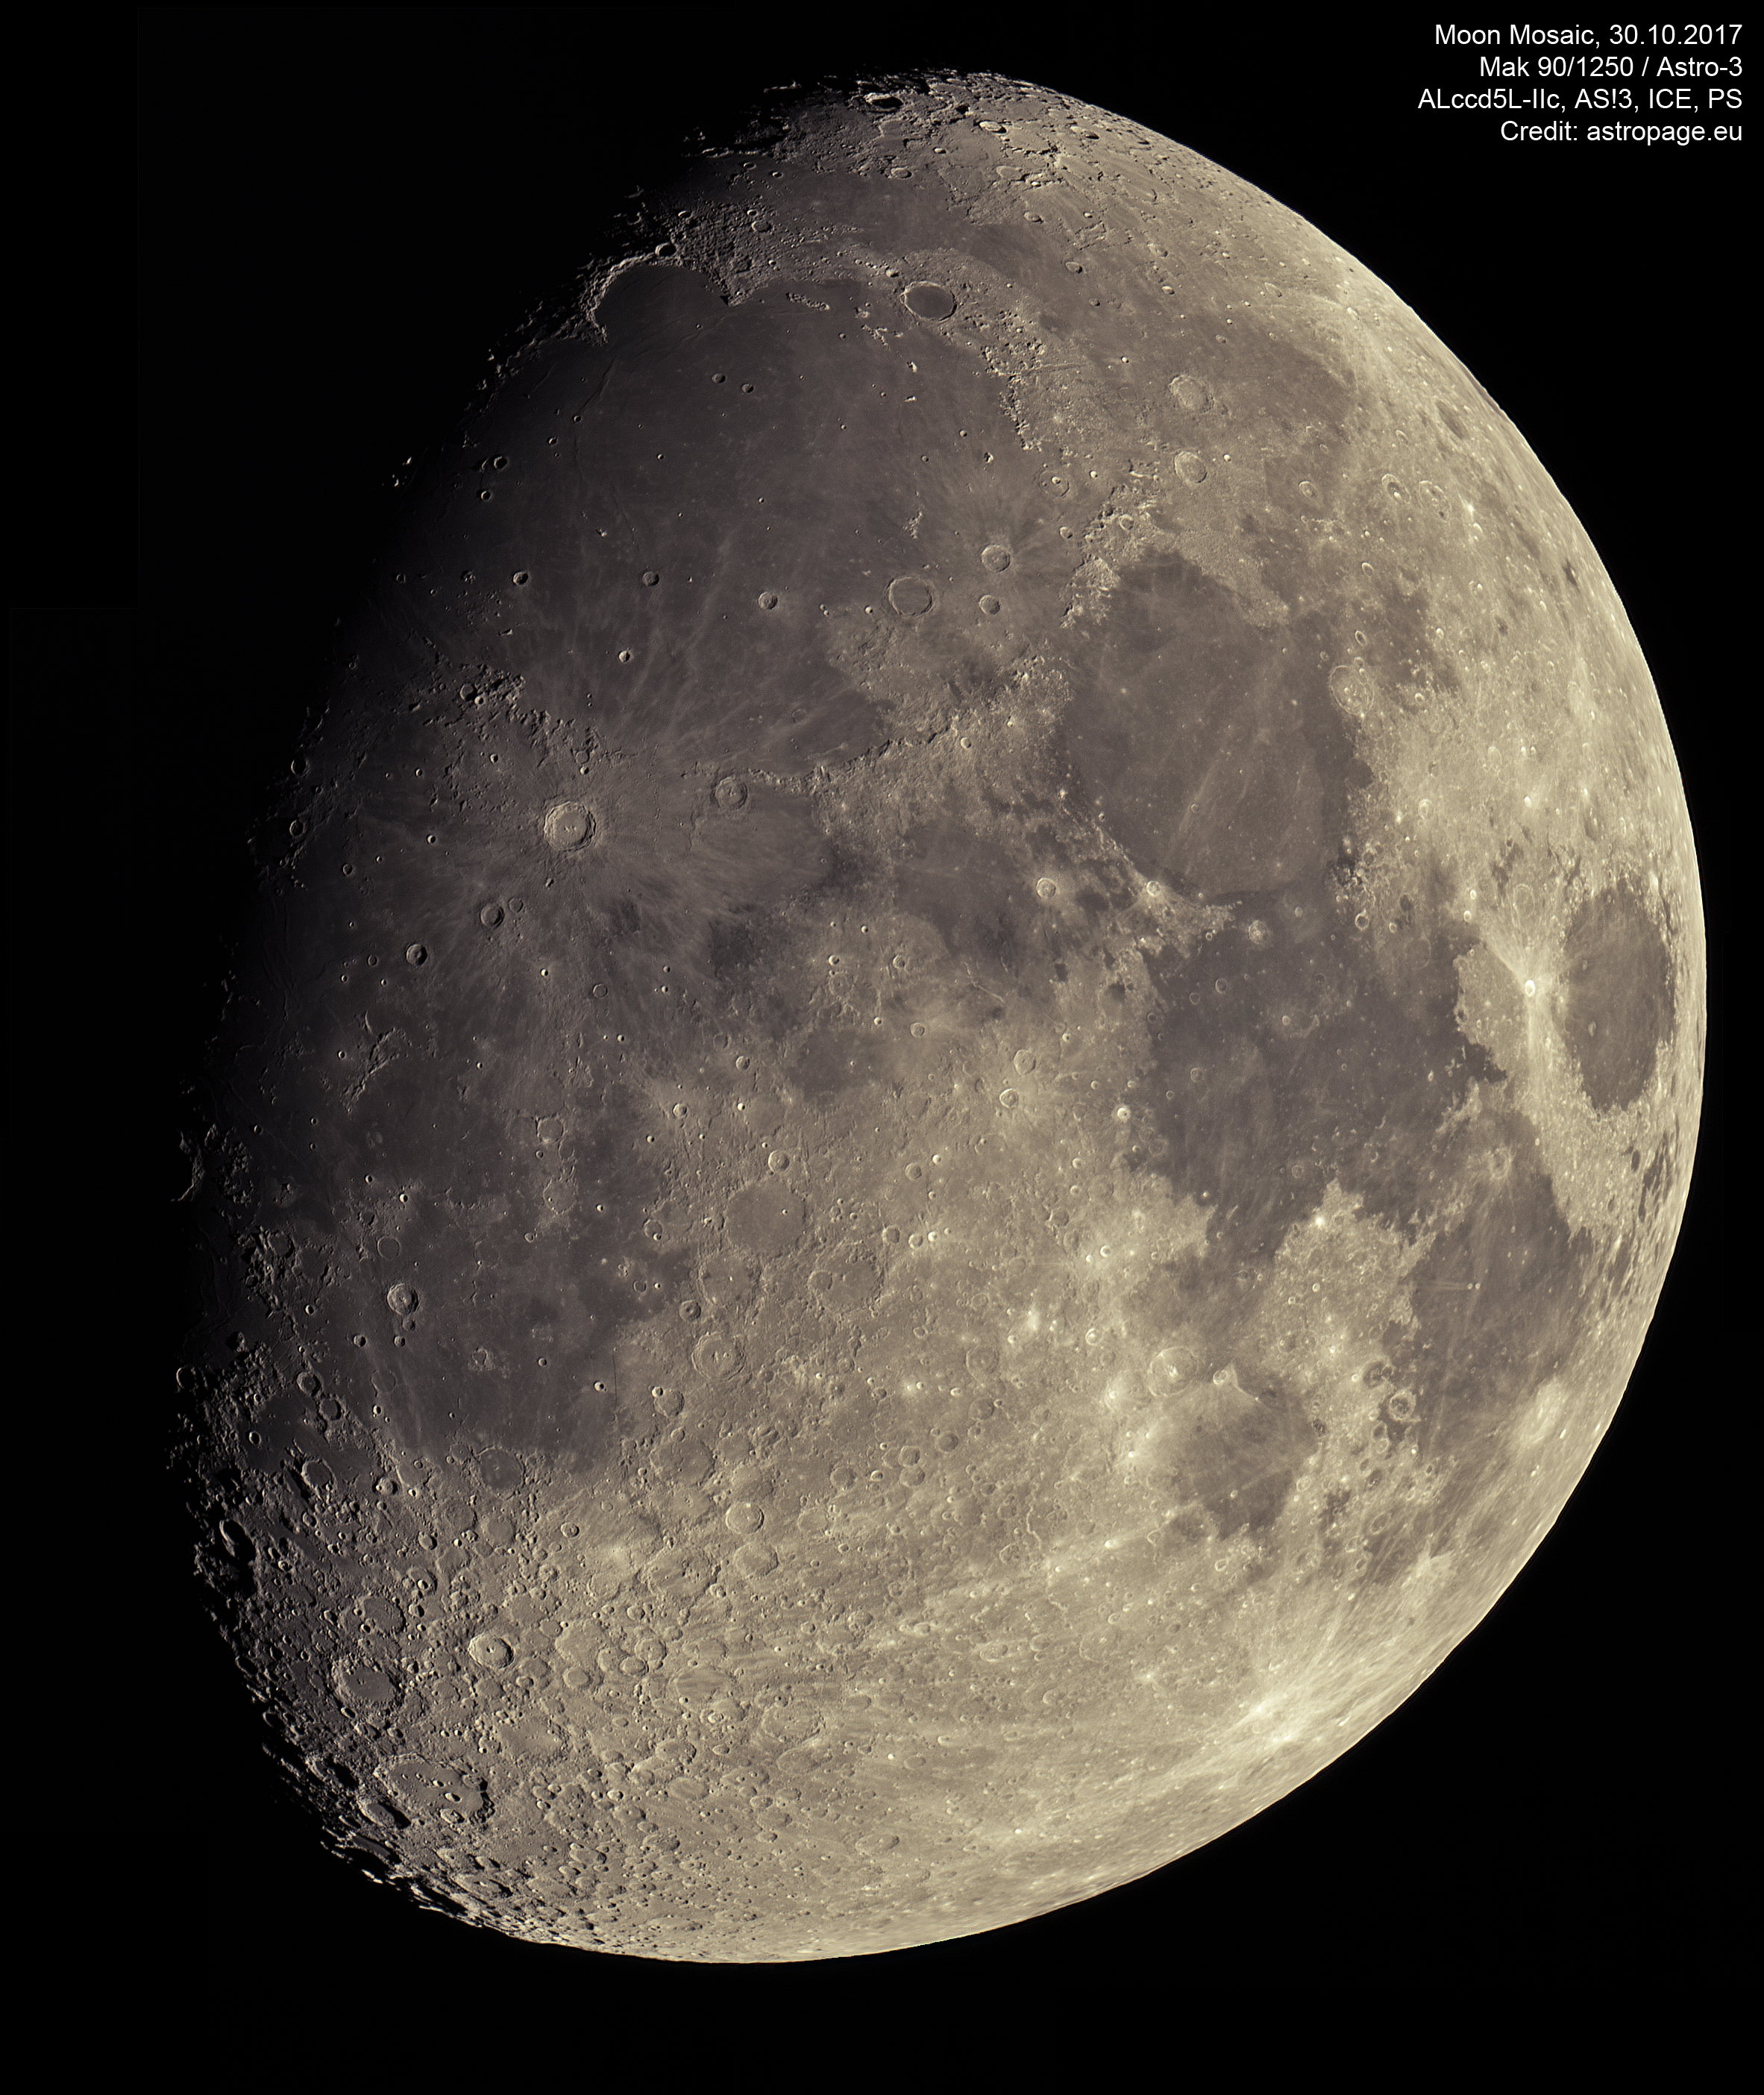 Mond-Mosaik vom 30. Oktober 2017. (Credit: astropage.eu)